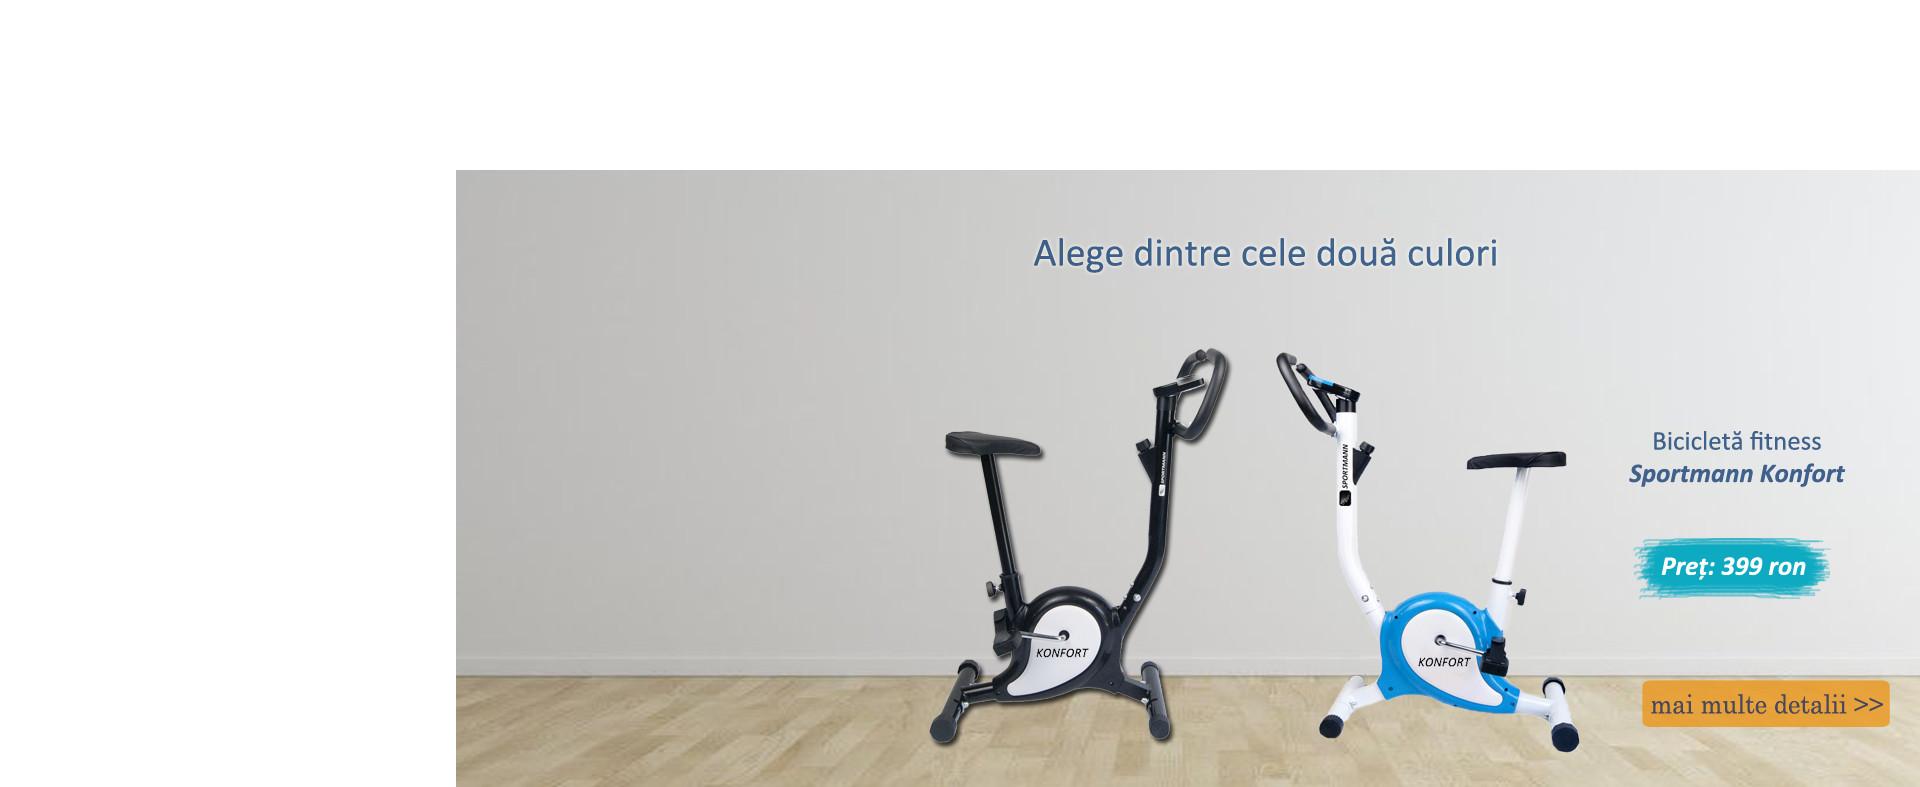 Bicicleta fitness Sportmann Konfort